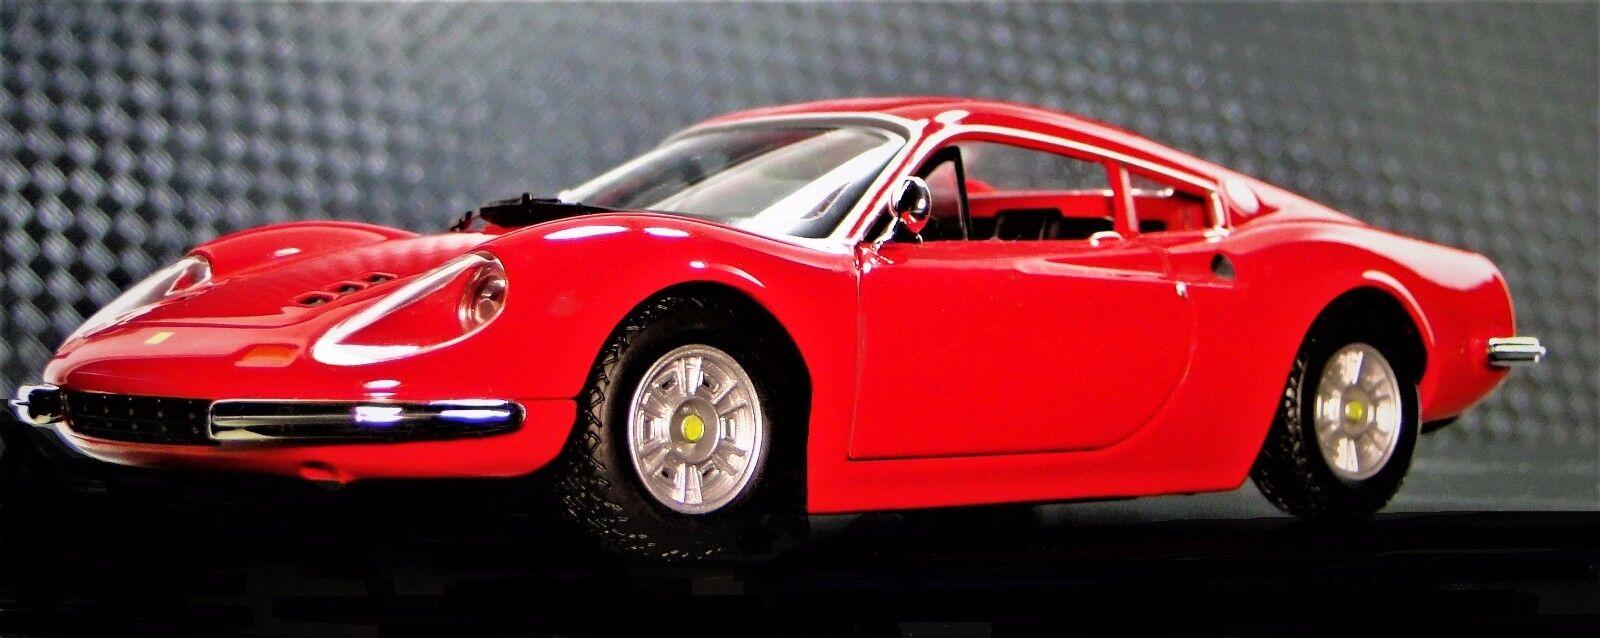 GT Ferrari 1 Vintage Sport Sport Sport Race Car 1960s 24 Metal 43 O 18 Carousel Red 12 F 64 6ed429